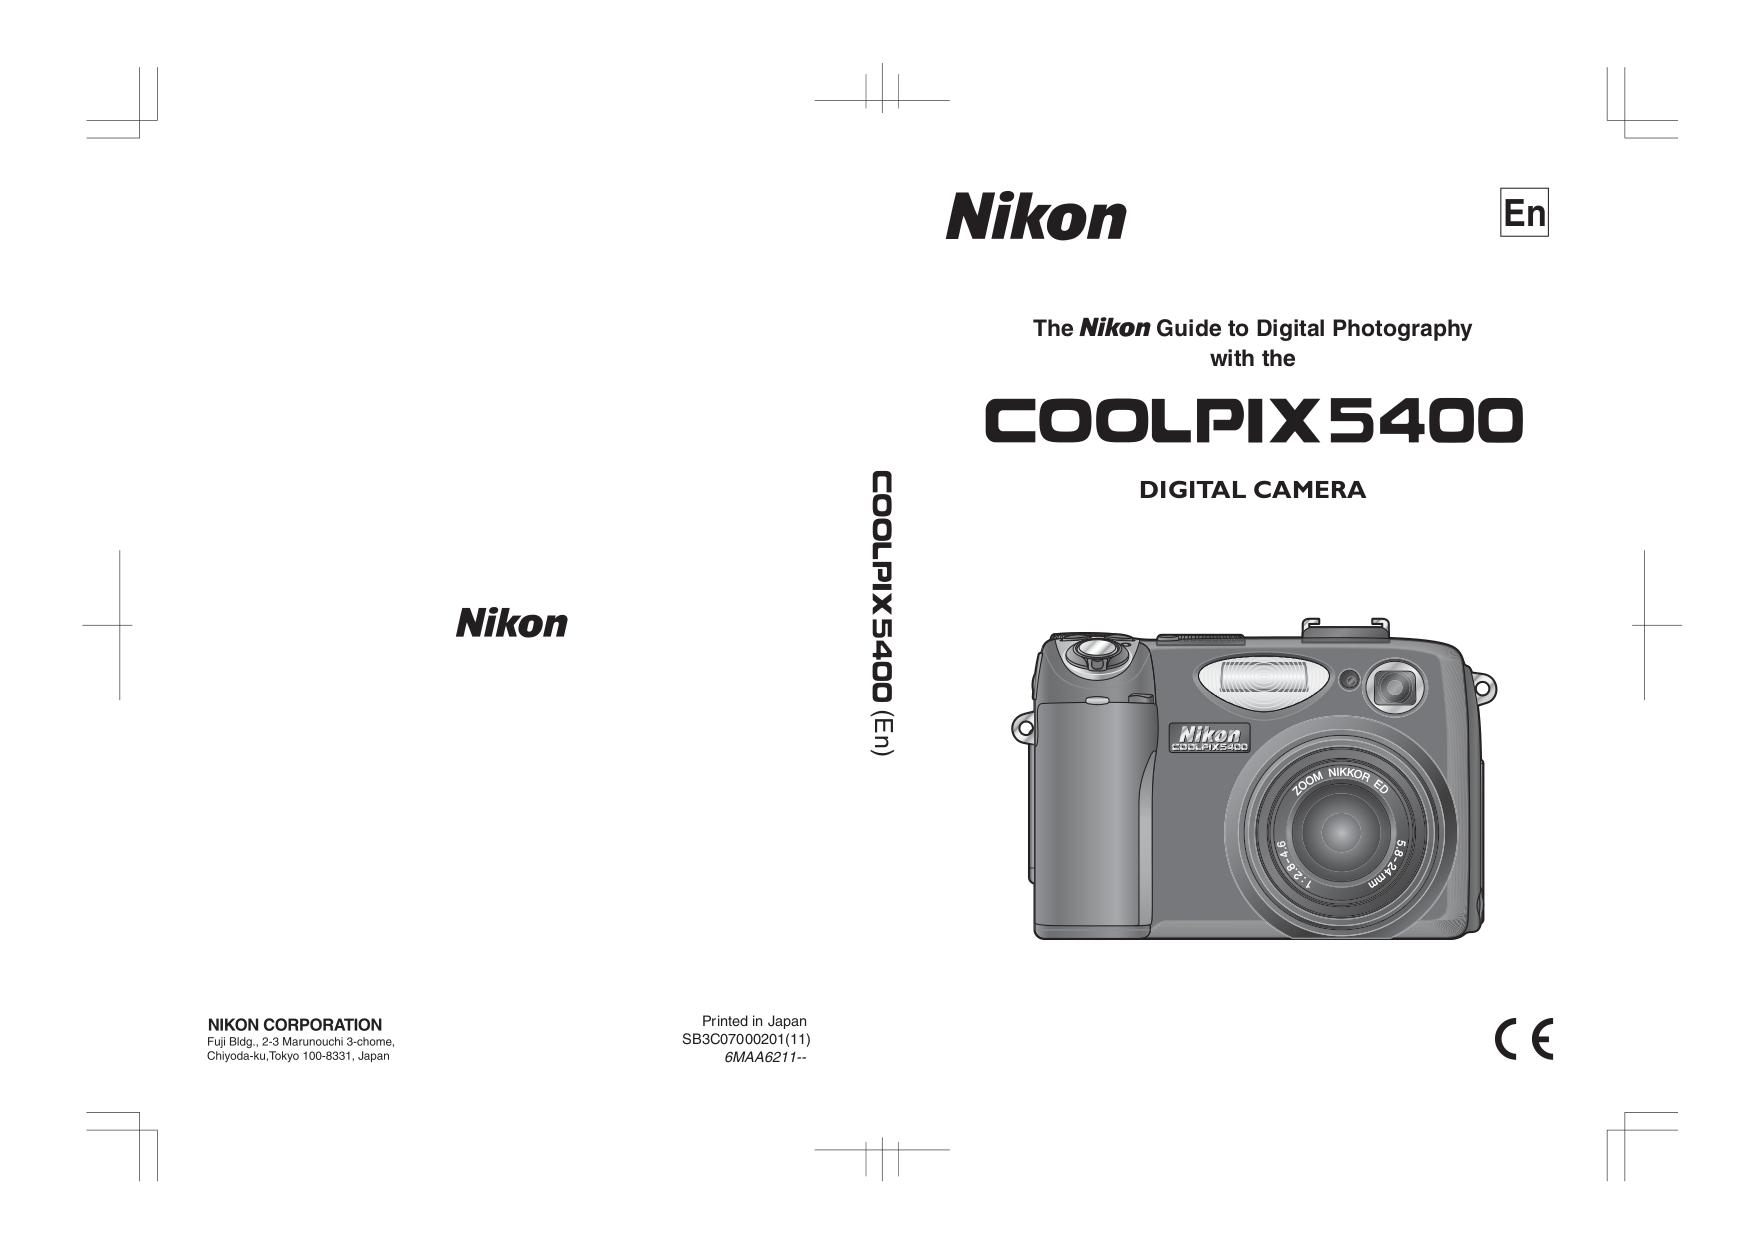 pdf for Nikon Other WC-E80 Camera Wide Angle Converter Lens manual